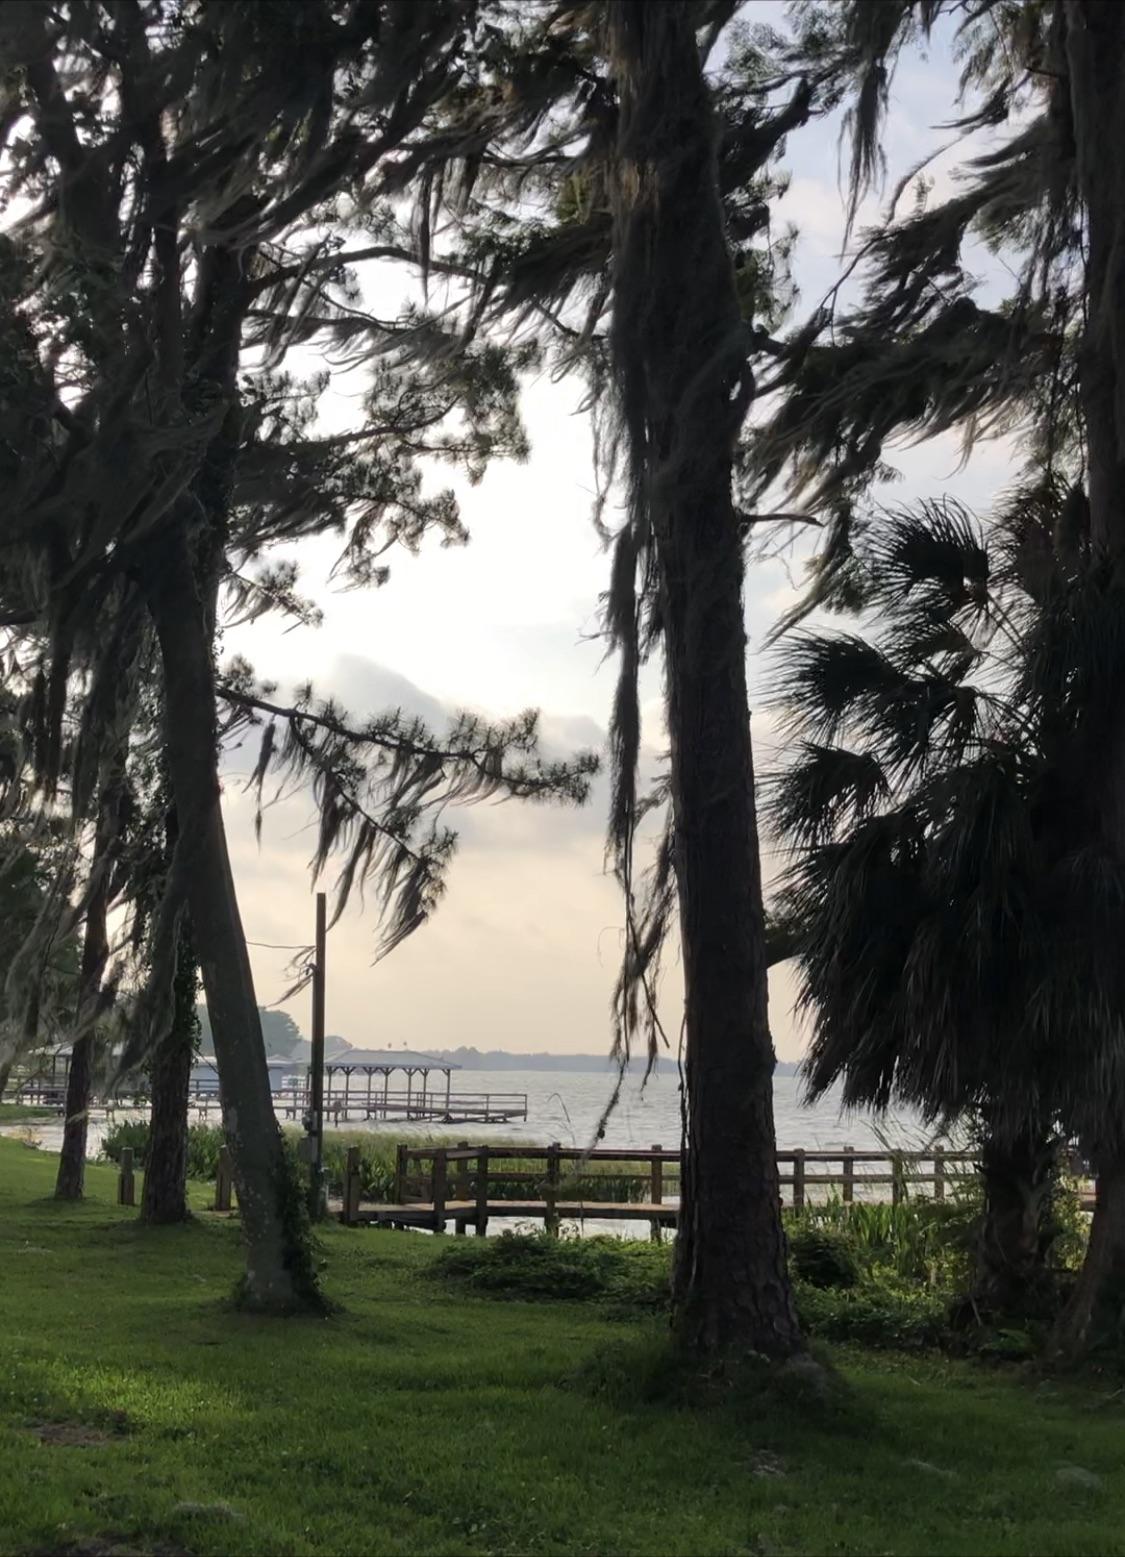 Lakeshore Lake View, Mount Dora, FL